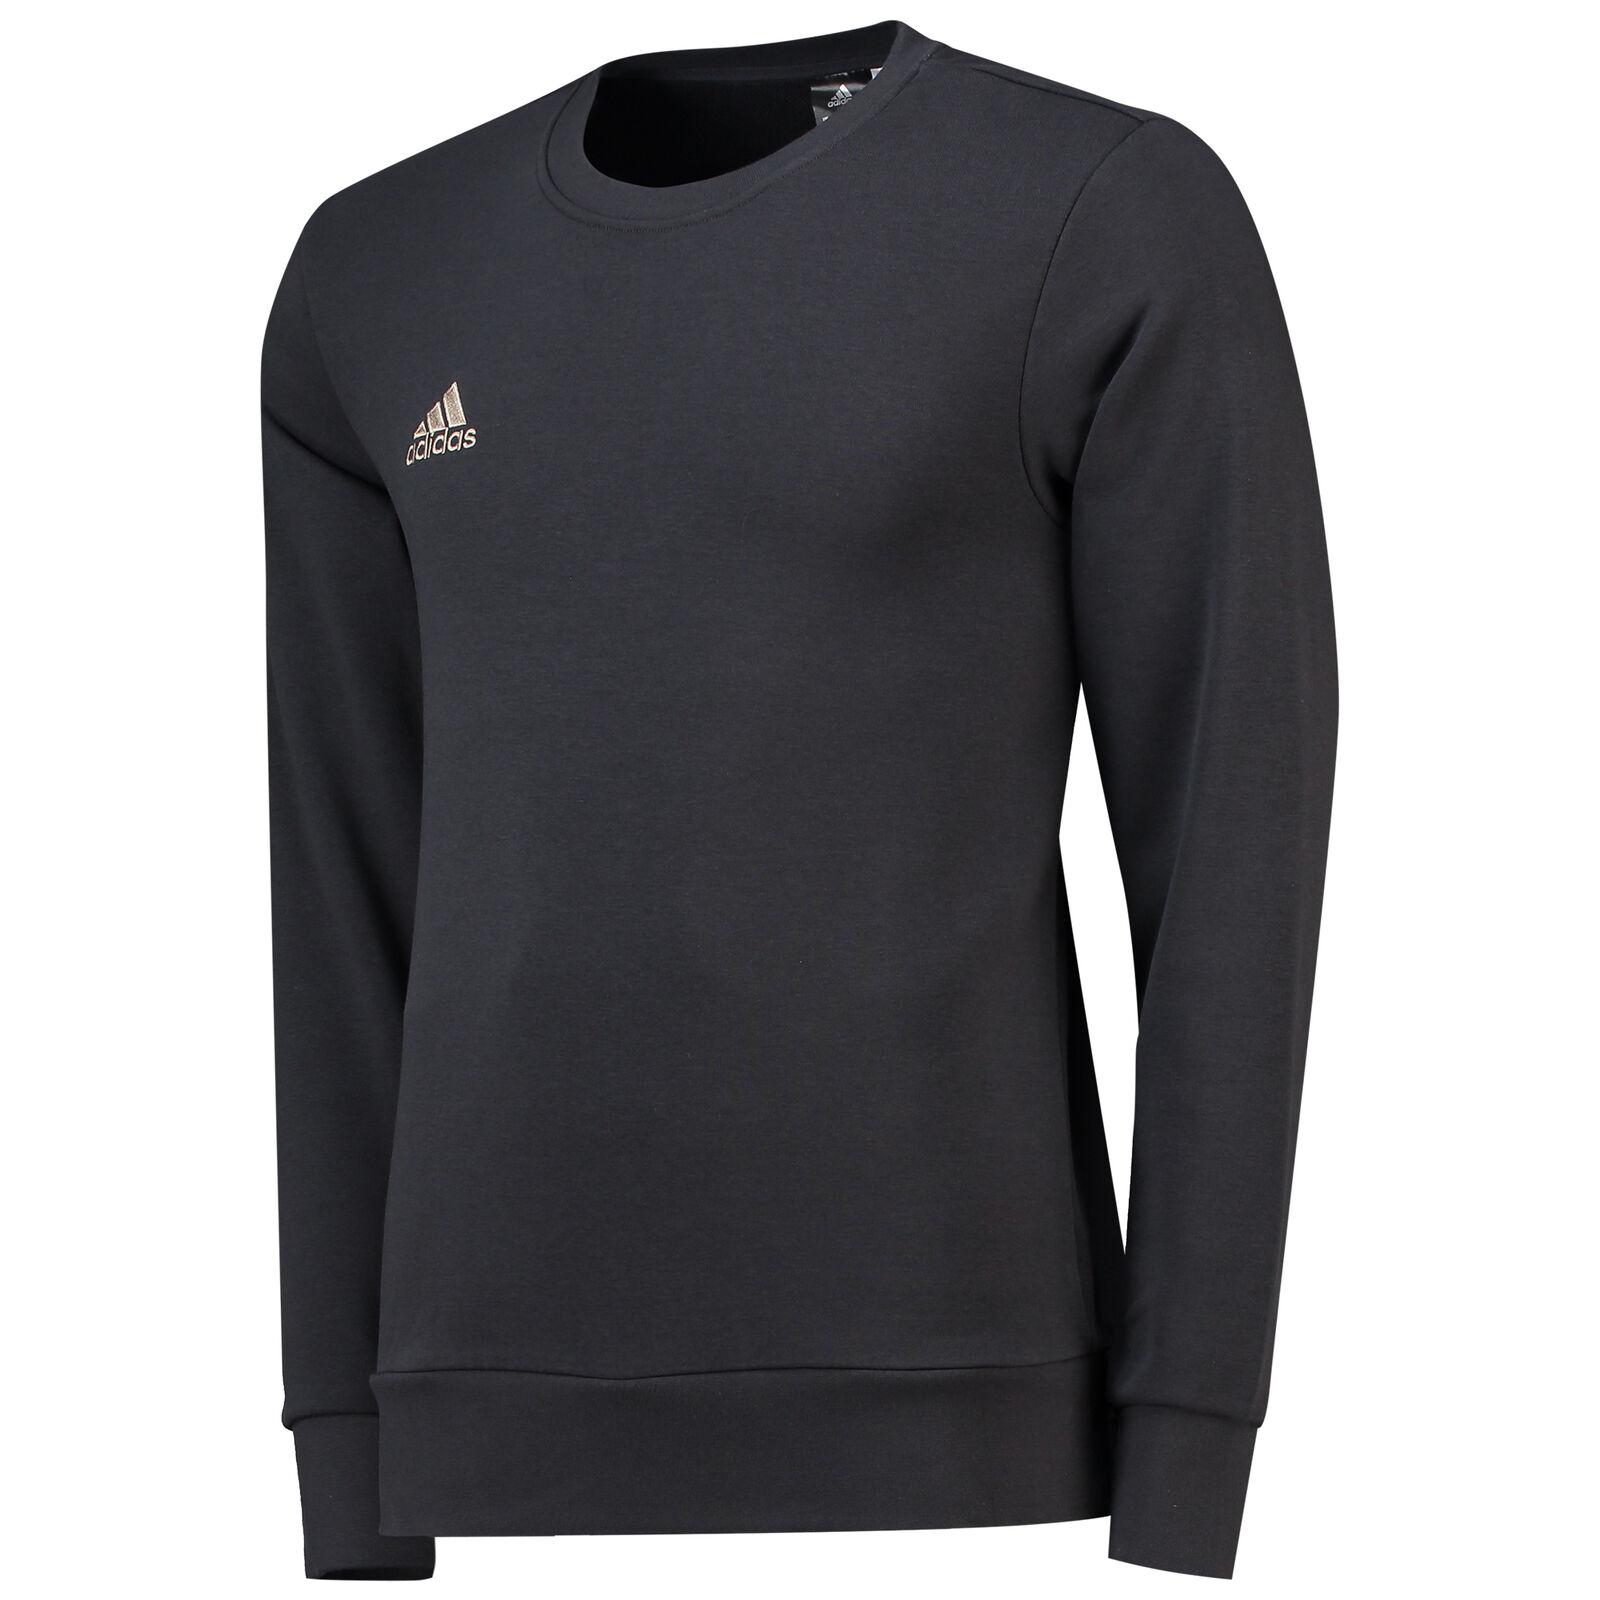 Ajax Offiziell Grafisch Grafisch Grafisch Sweatshirt Hemd Langarm Herren adidas Fußball Dunkelgrau 9cf920